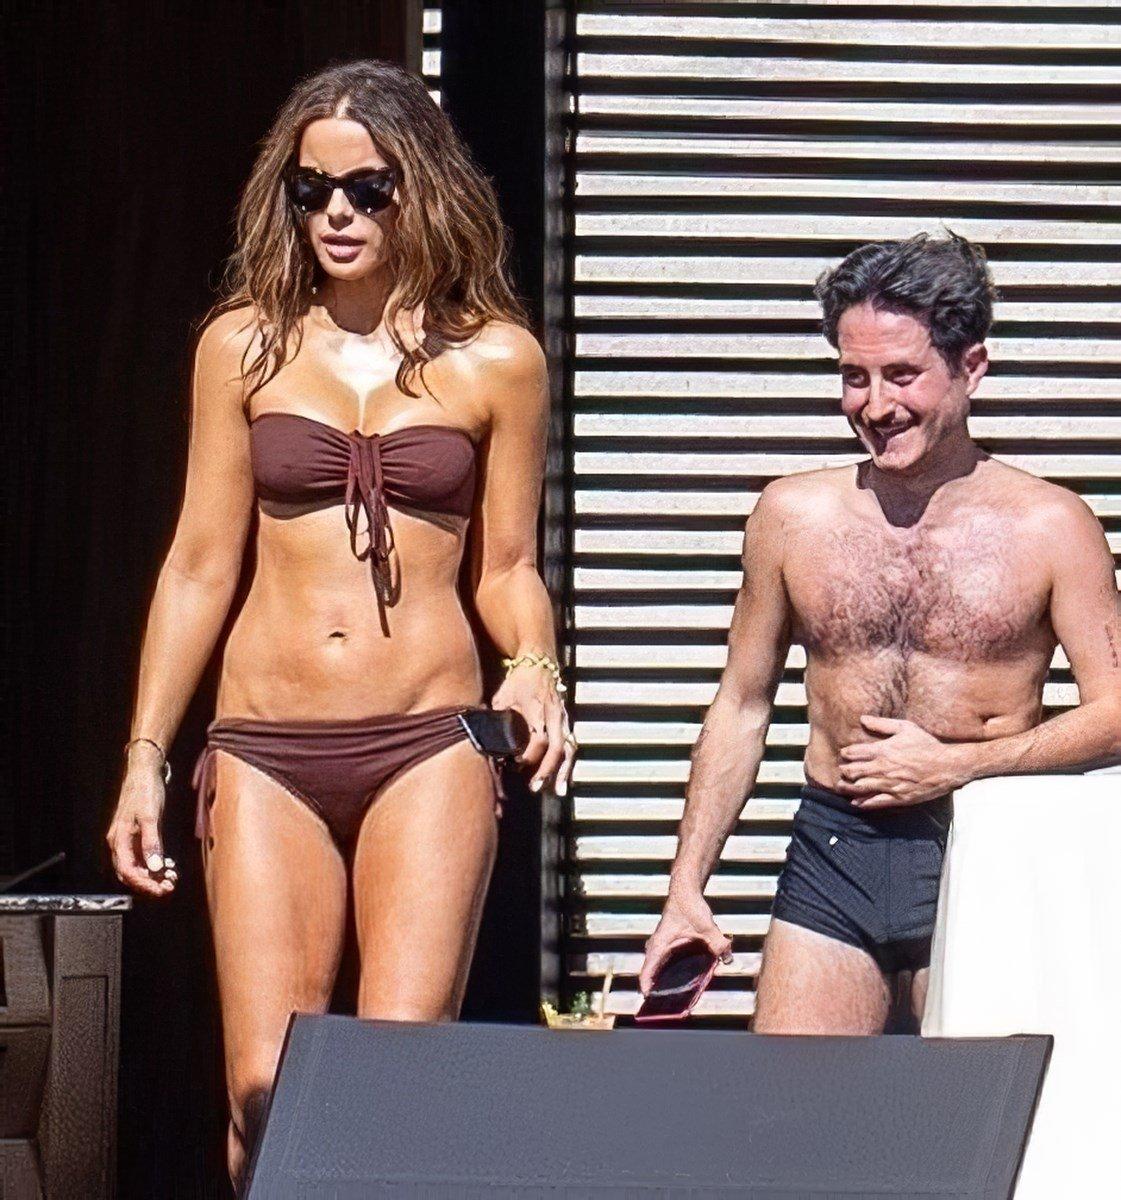 Kate Beckinsale Candid Bikini Pics With Her New Boy Toy